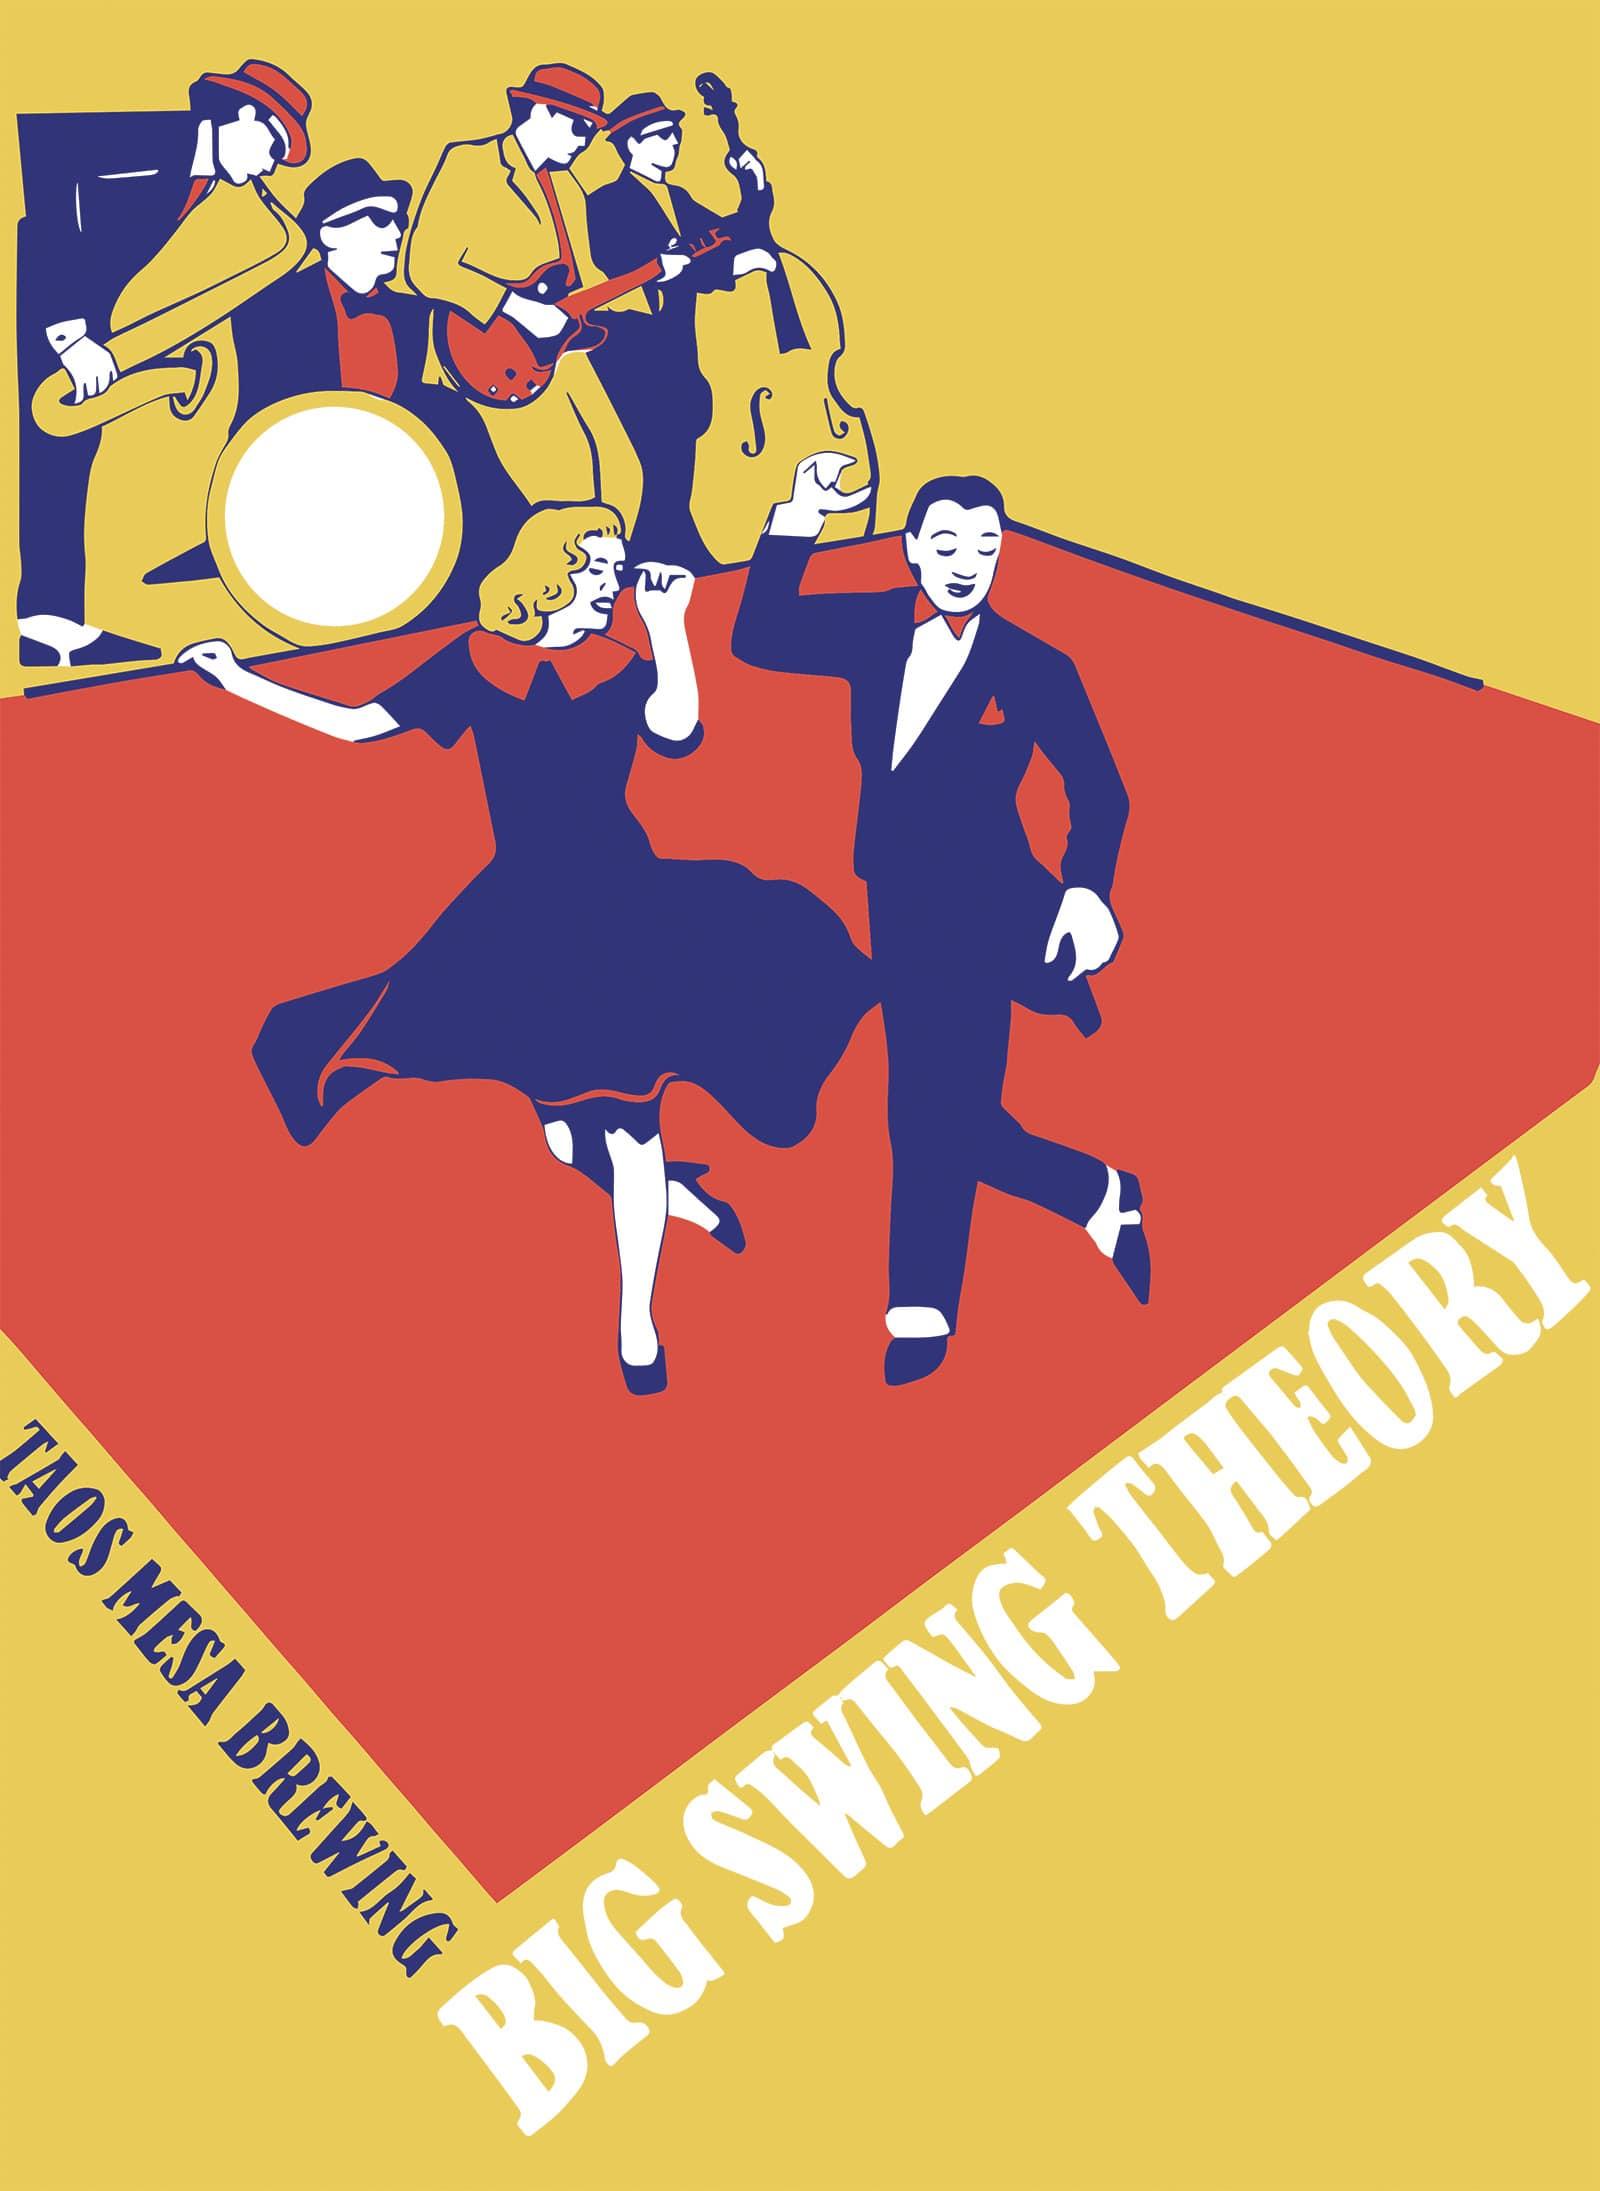 Dance Night with Big Swing Theory!